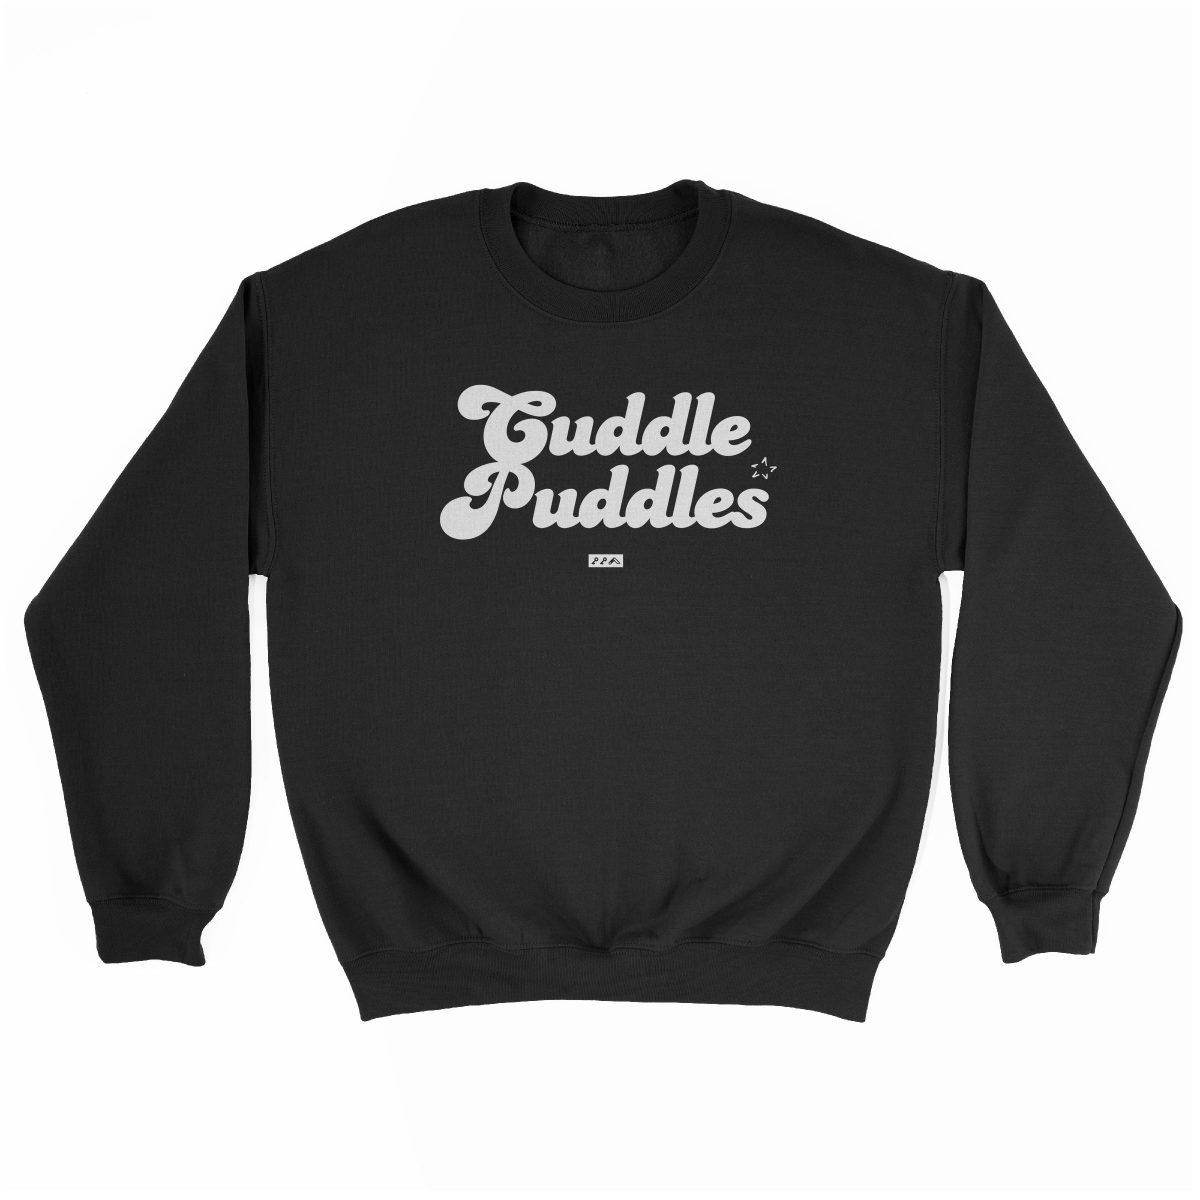 CUDDLE PUDDLE PARTY comfy sweatshirt in black at kikicutt.com